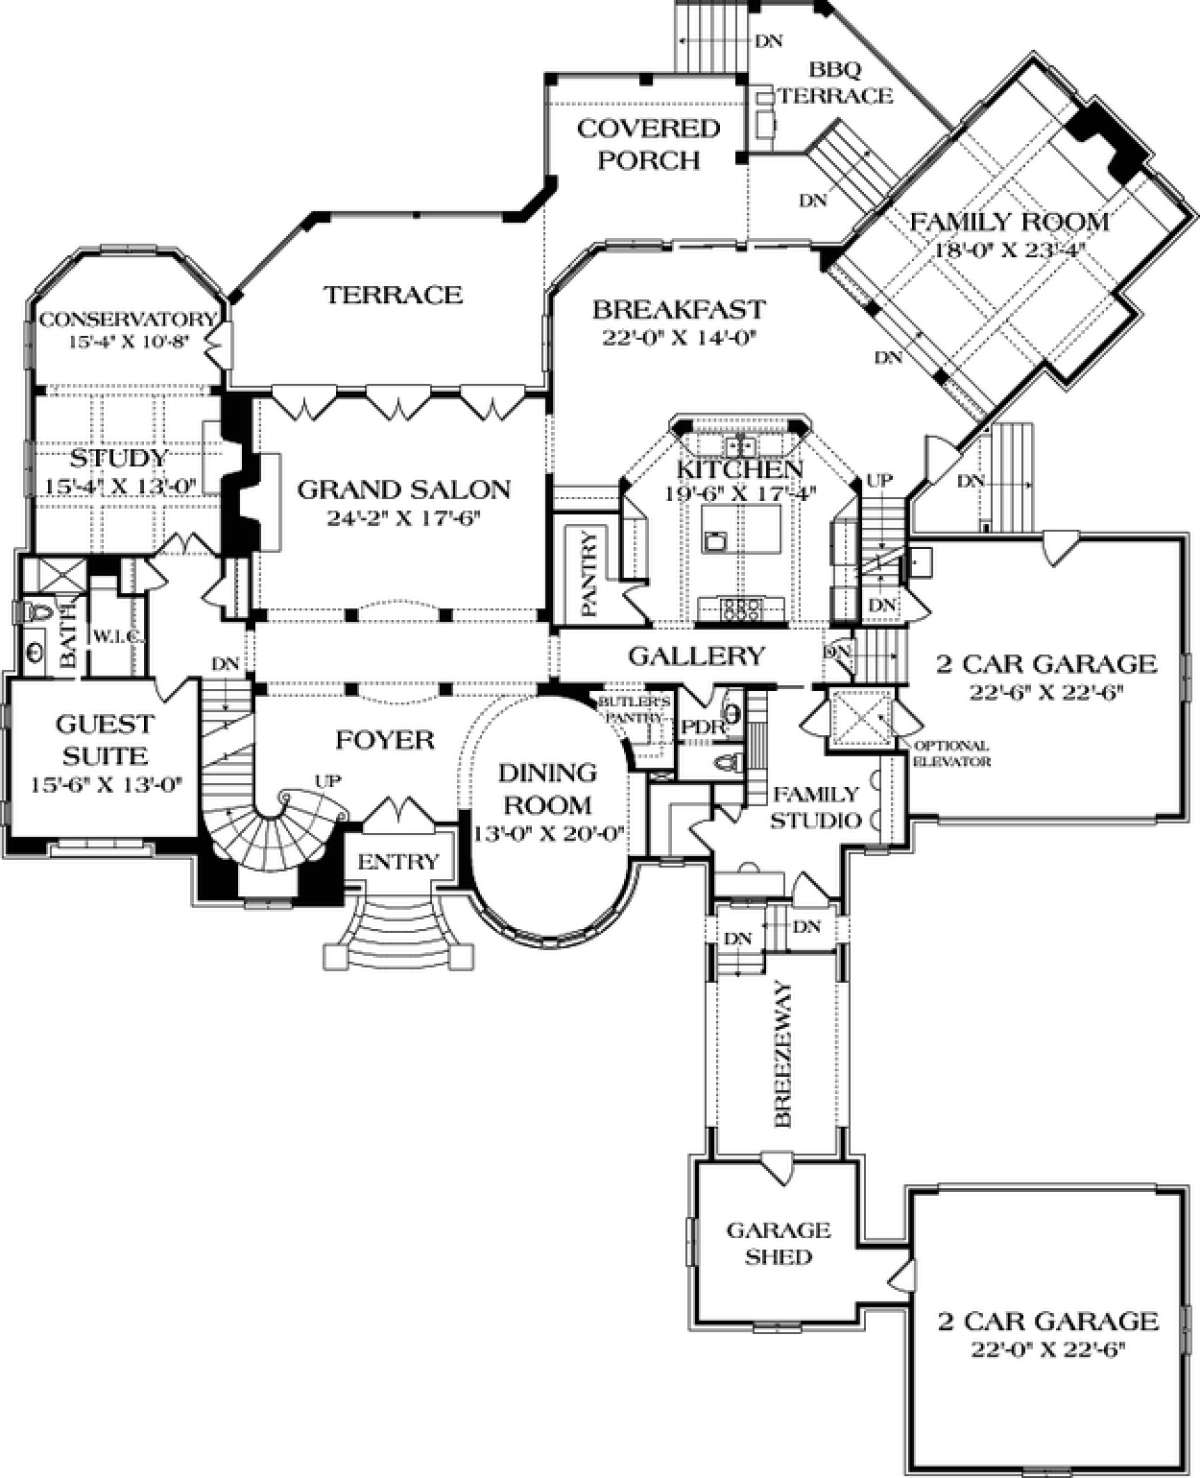 Luxury Plan 10 467 Square Feet 6 Bedrooms 6 5 Bathrooms 3323 00530